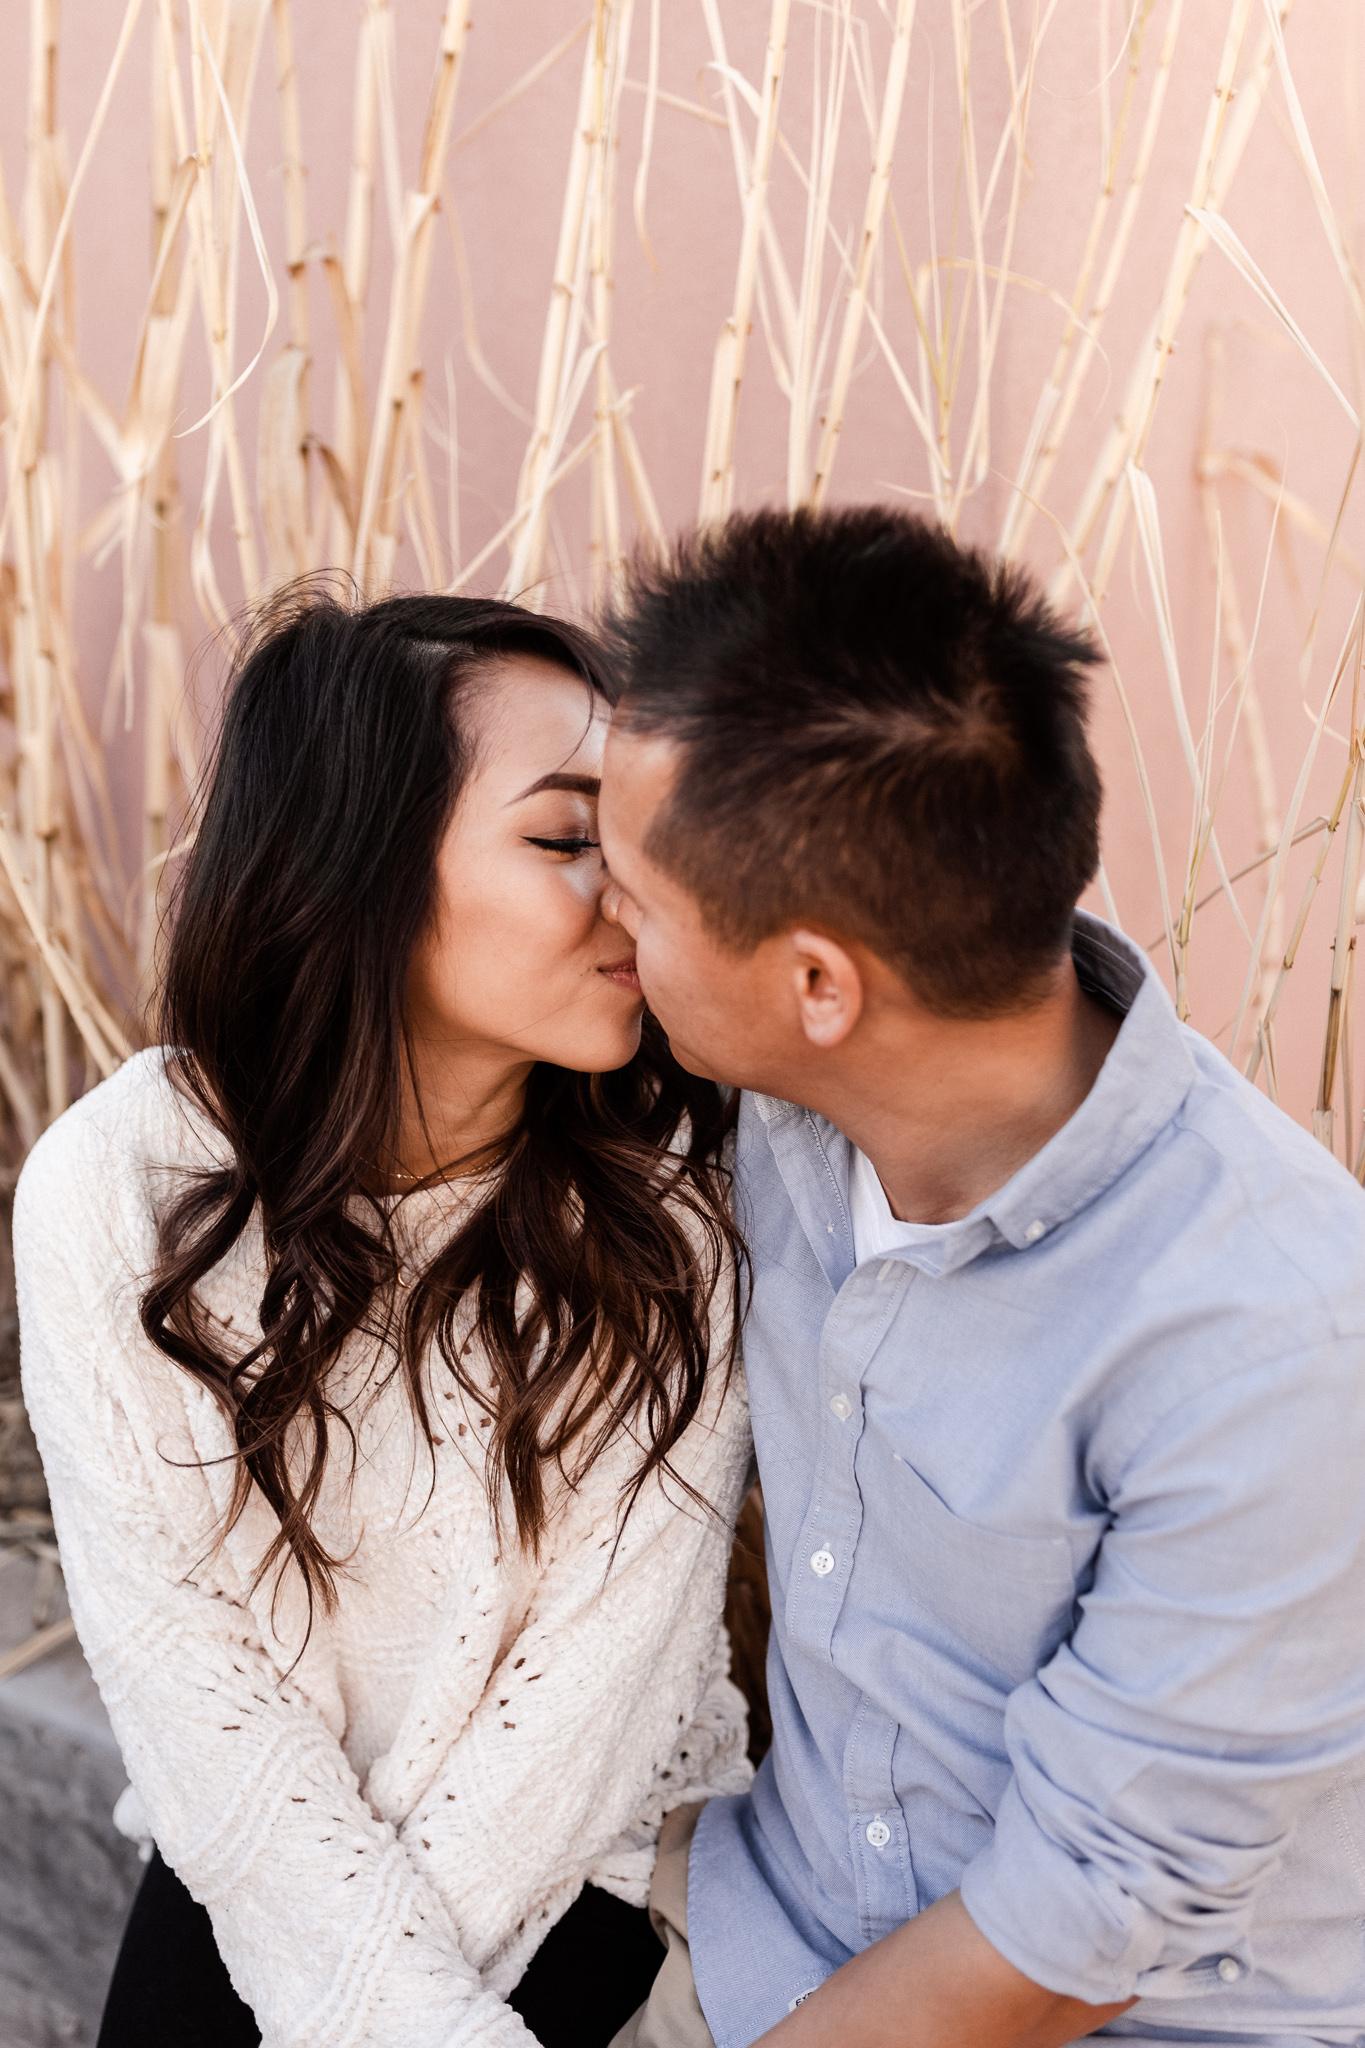 Hieu + Teresa | Colorful Romantic Downtown Engagements | Oklahoma Wedding Photographer-36.jpg